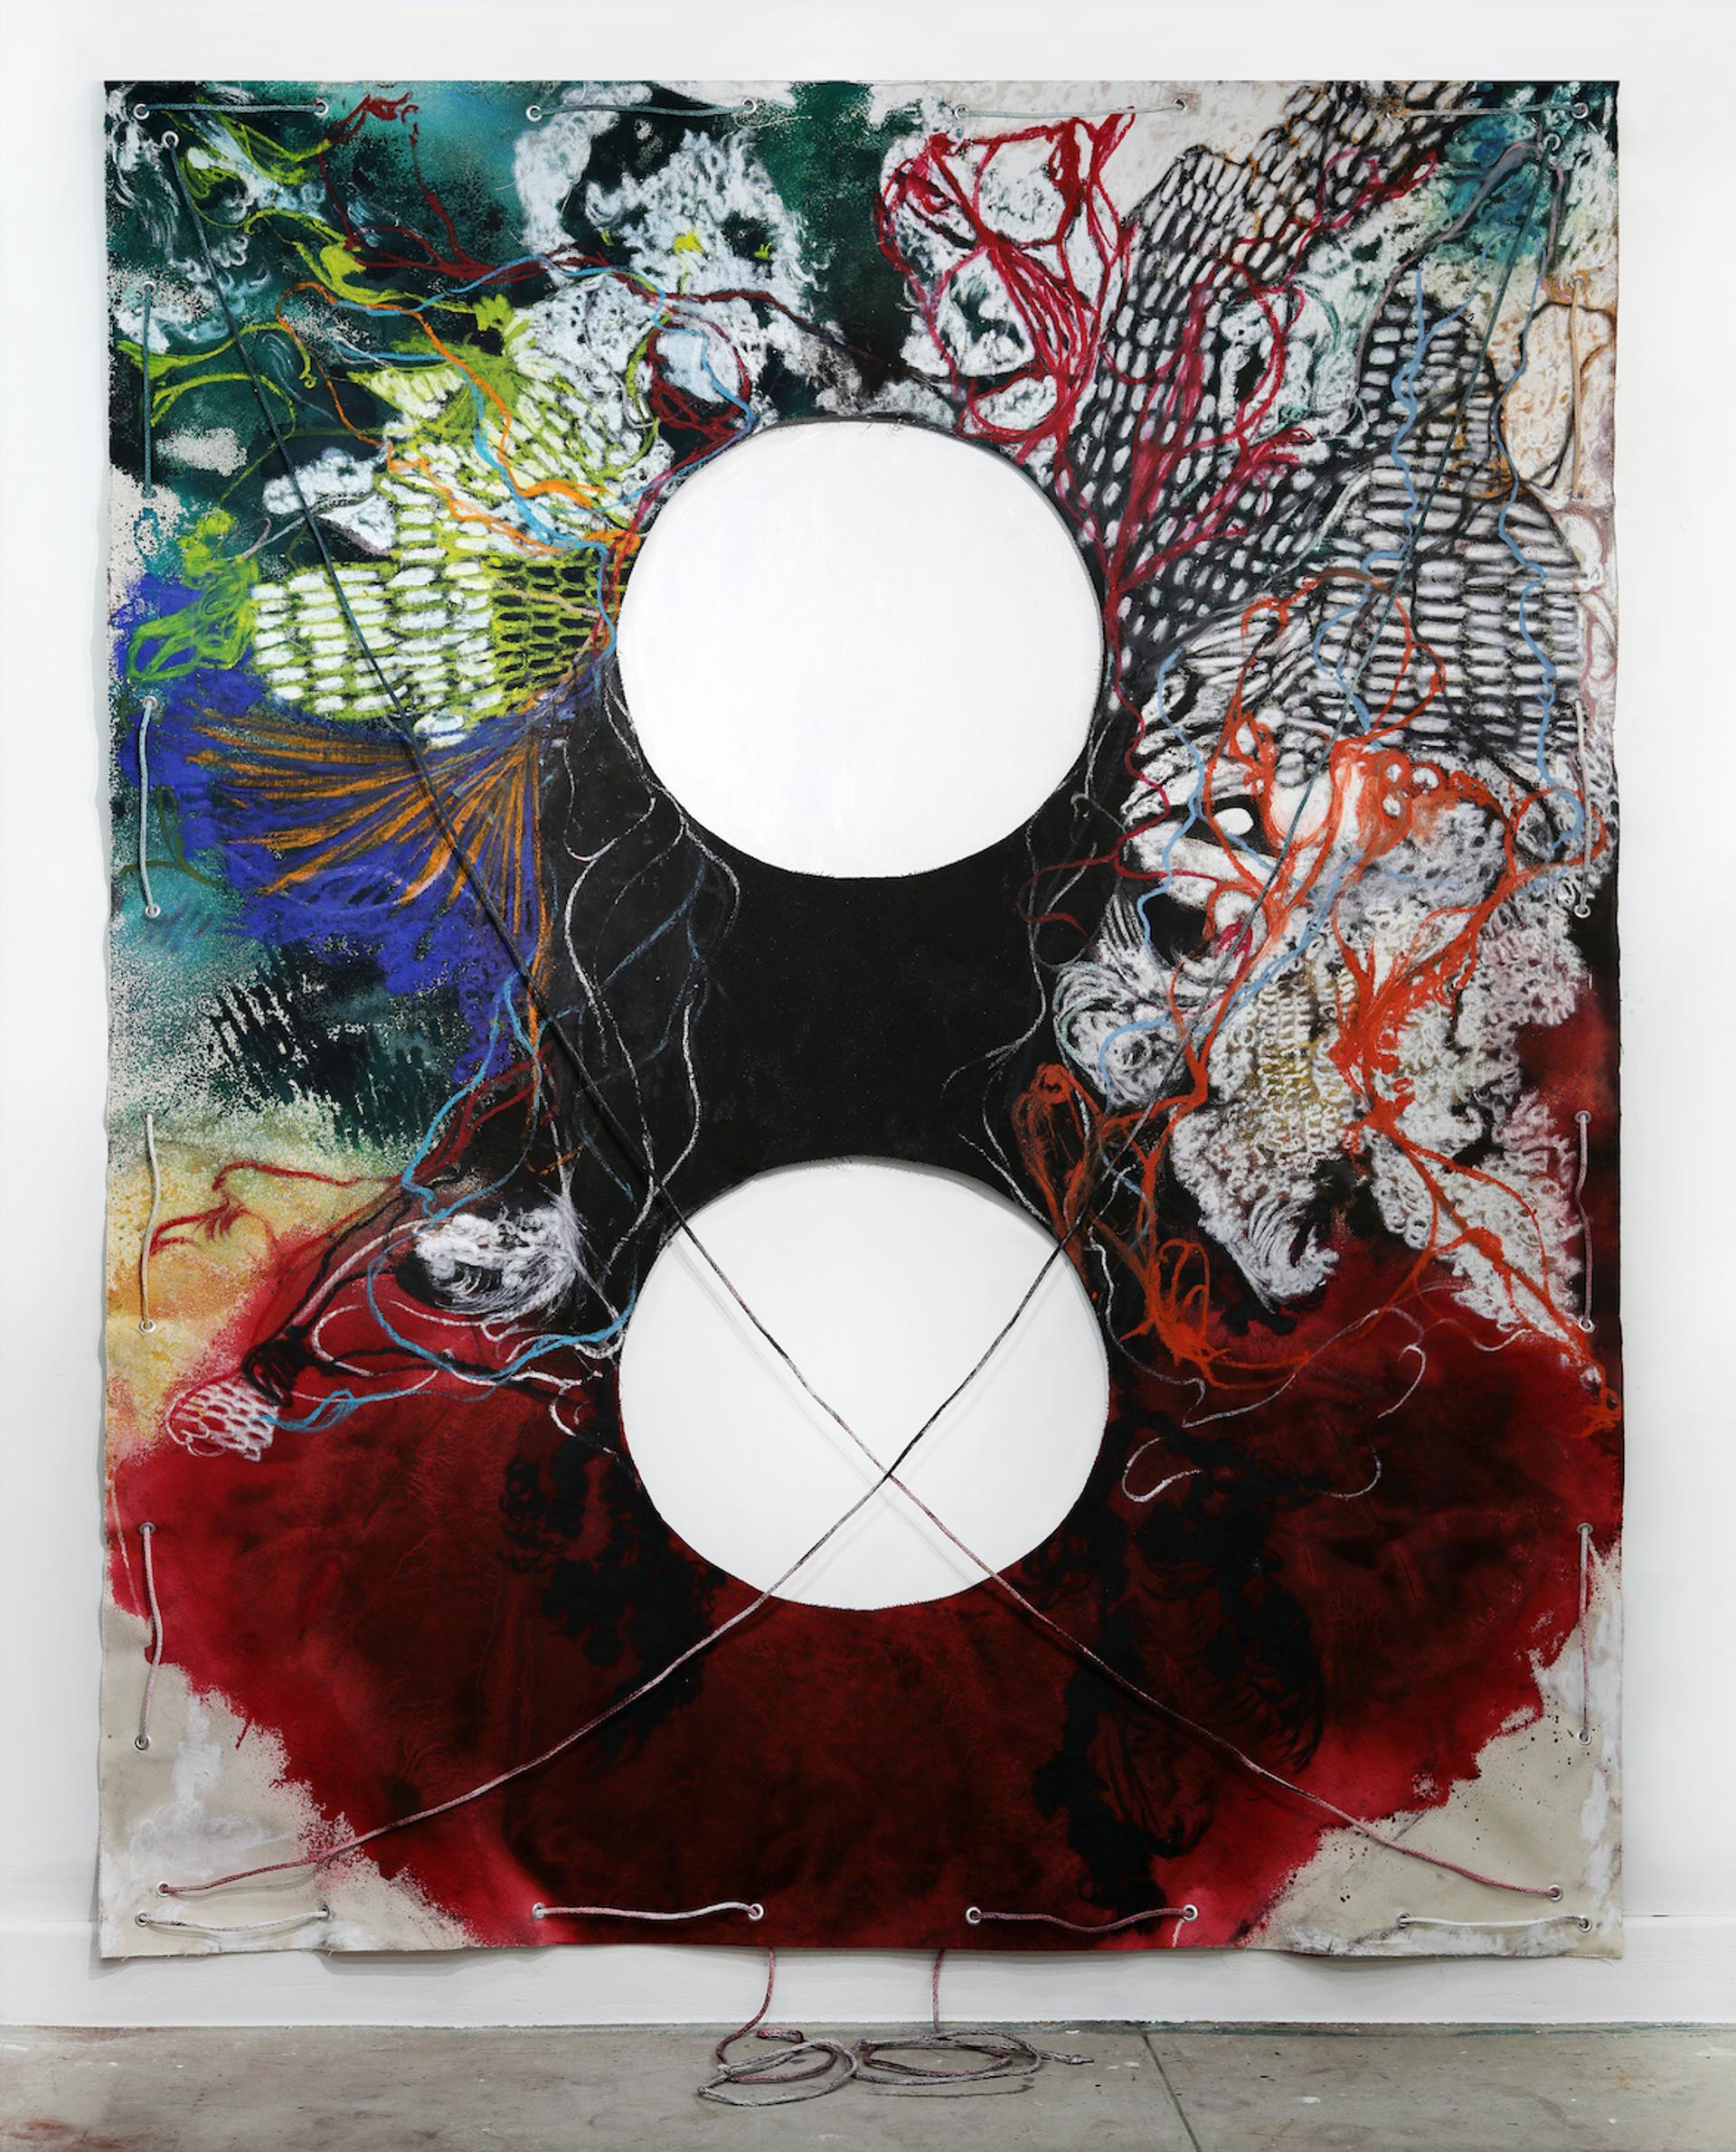 Tokyo gallery Misako & Rosen will feature works by Naotaka Hiro in FAIR. Courtesy of the artist and Misako & Rosen